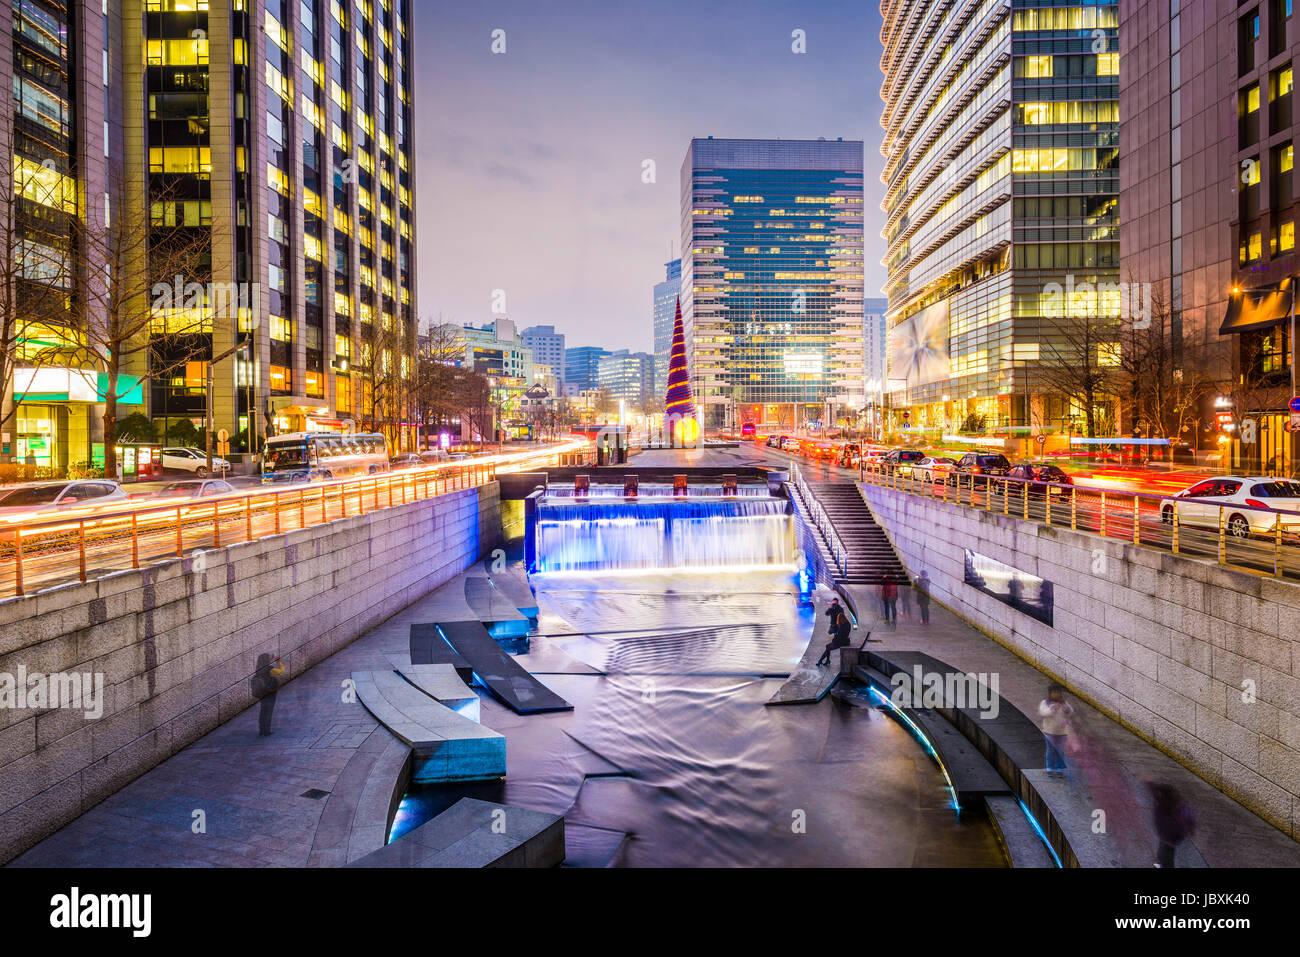 Seoul, South Korea cityscape at Cheonggye Stream. - Stock Image